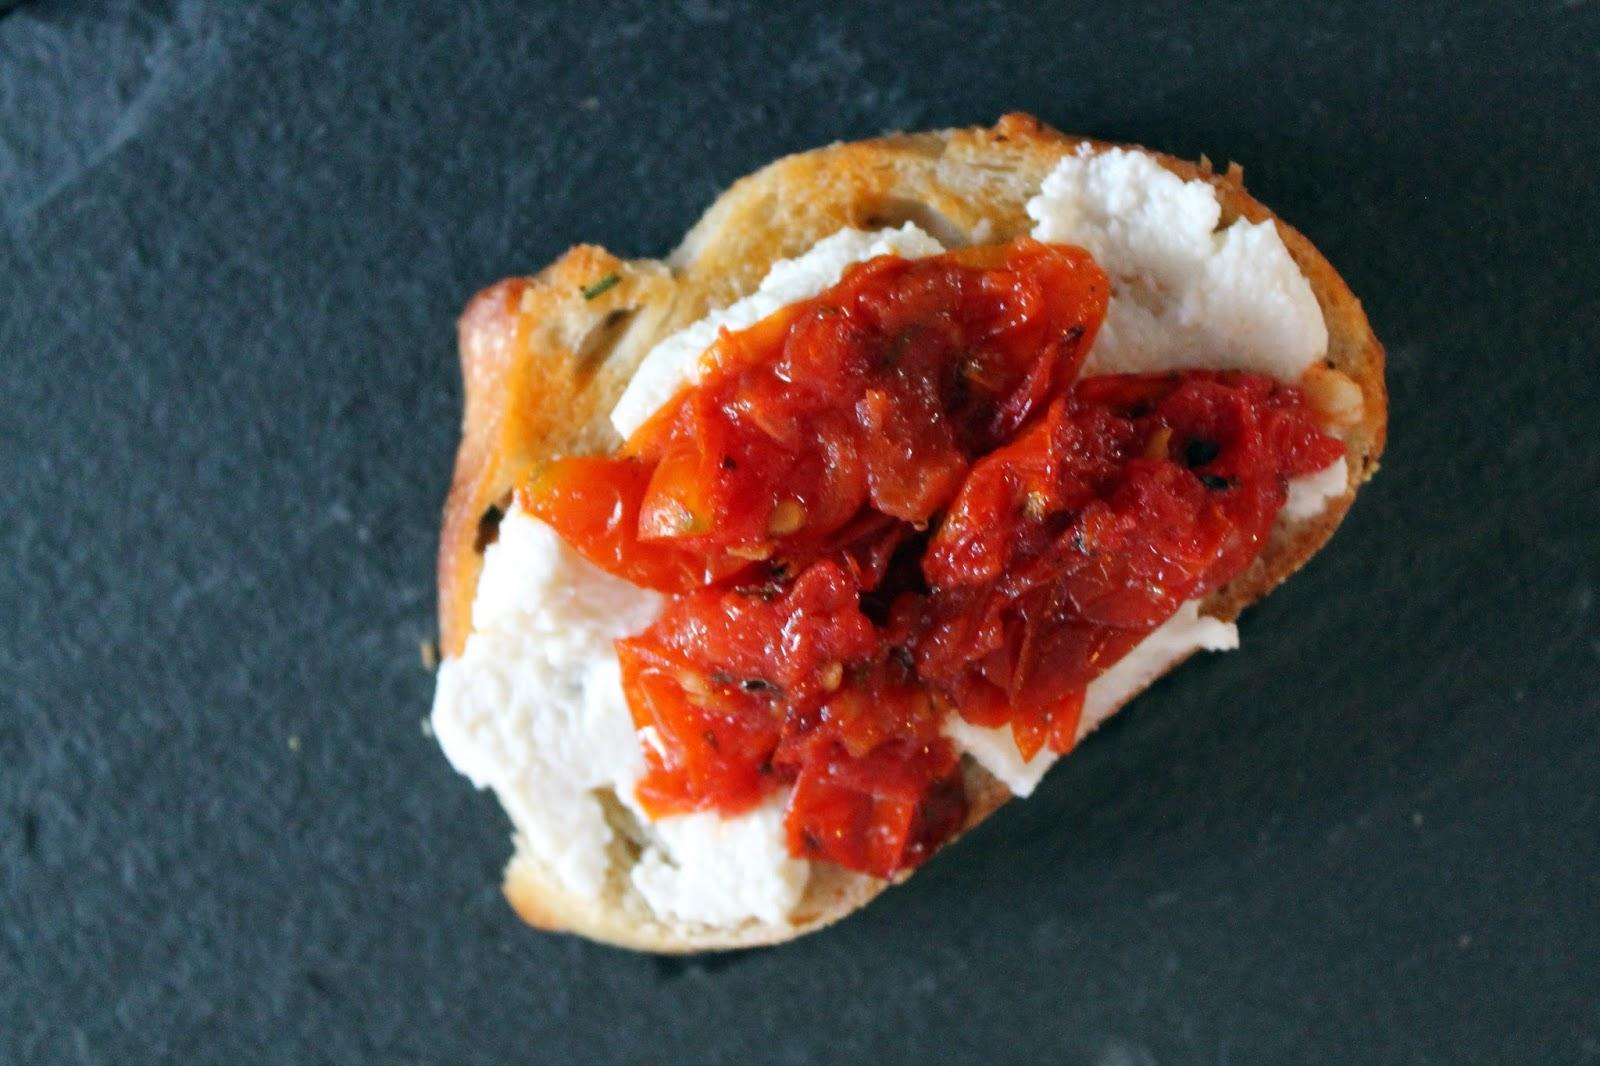 Something Yummy This Way Comes: Rosemary Roasted Tomato Bruschetta